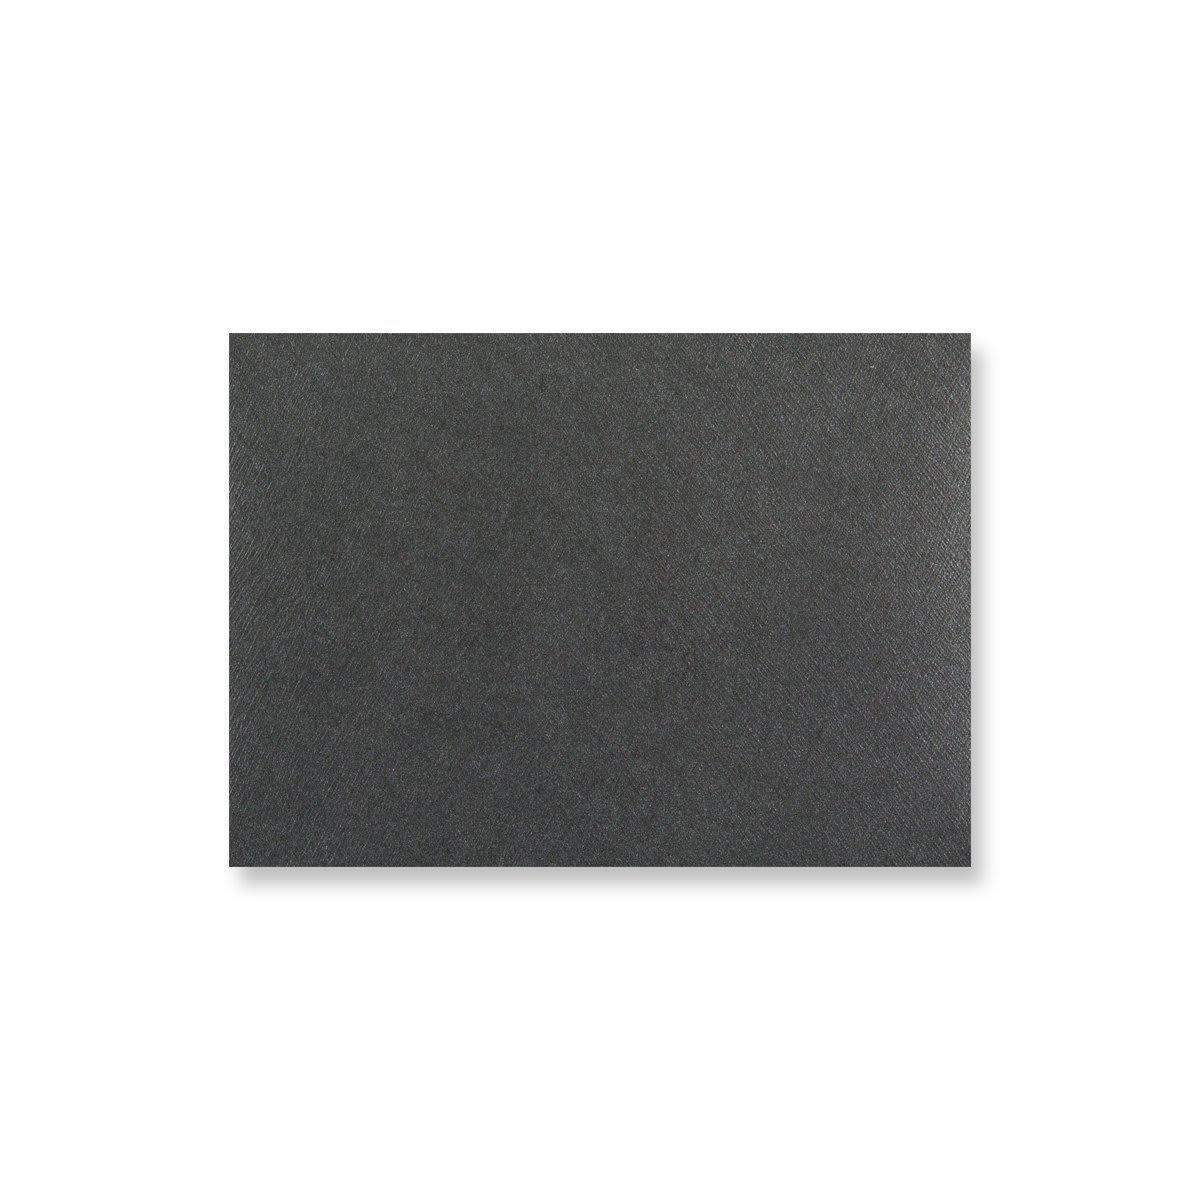 C7 SLATE GREY BUTTERFLY ENVELOPES